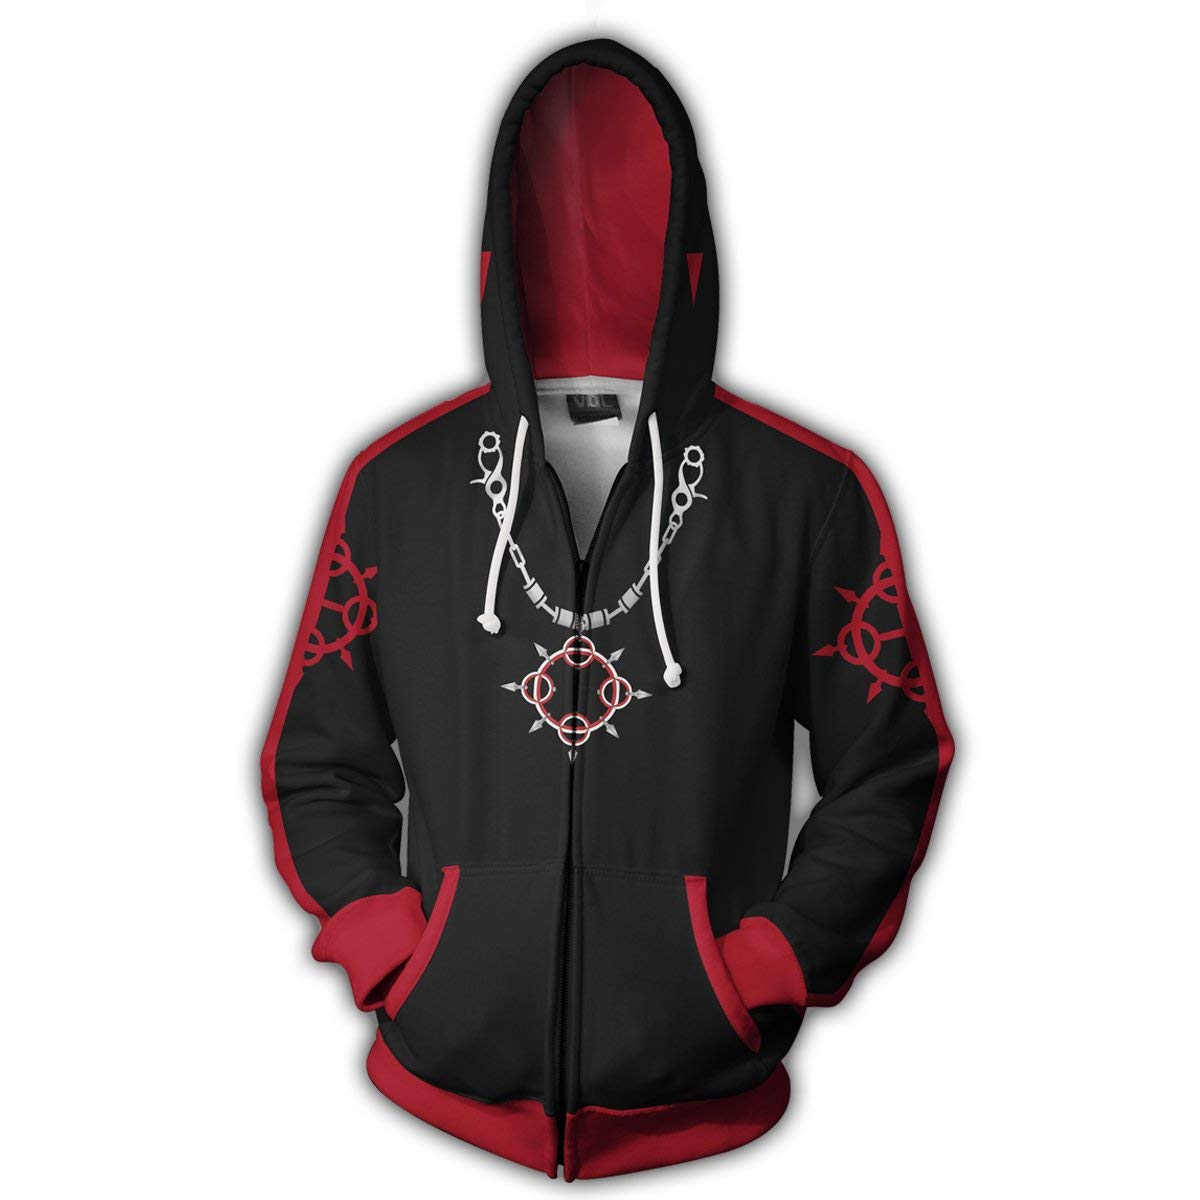 VOSTE Axel Costume Halloween Game Cosplay Zip Up Hoodie Jacket (X-Large, Color 6)